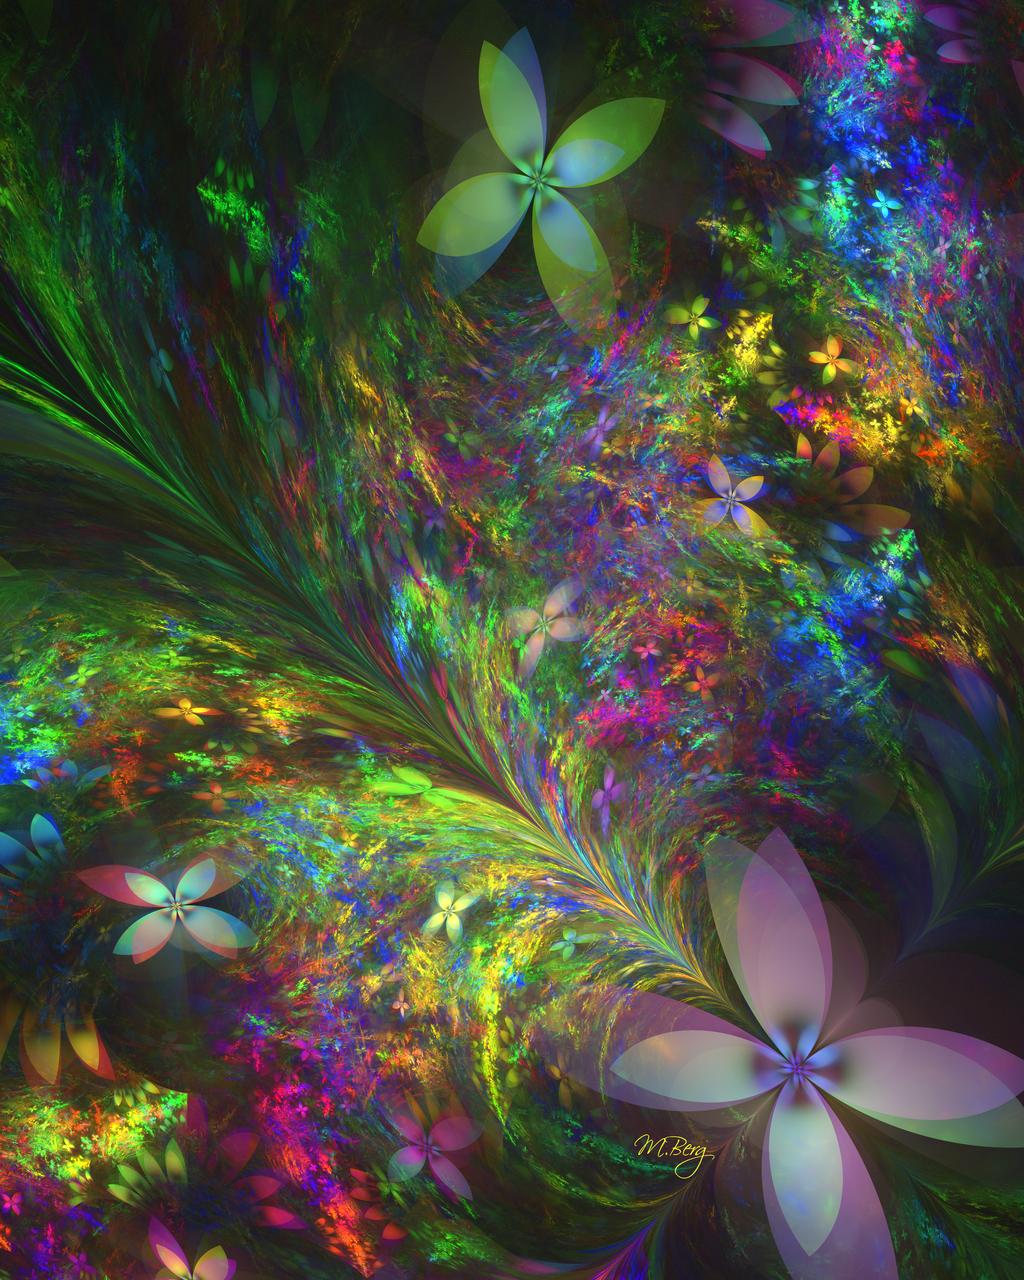 Butterfly Garden by myberg2